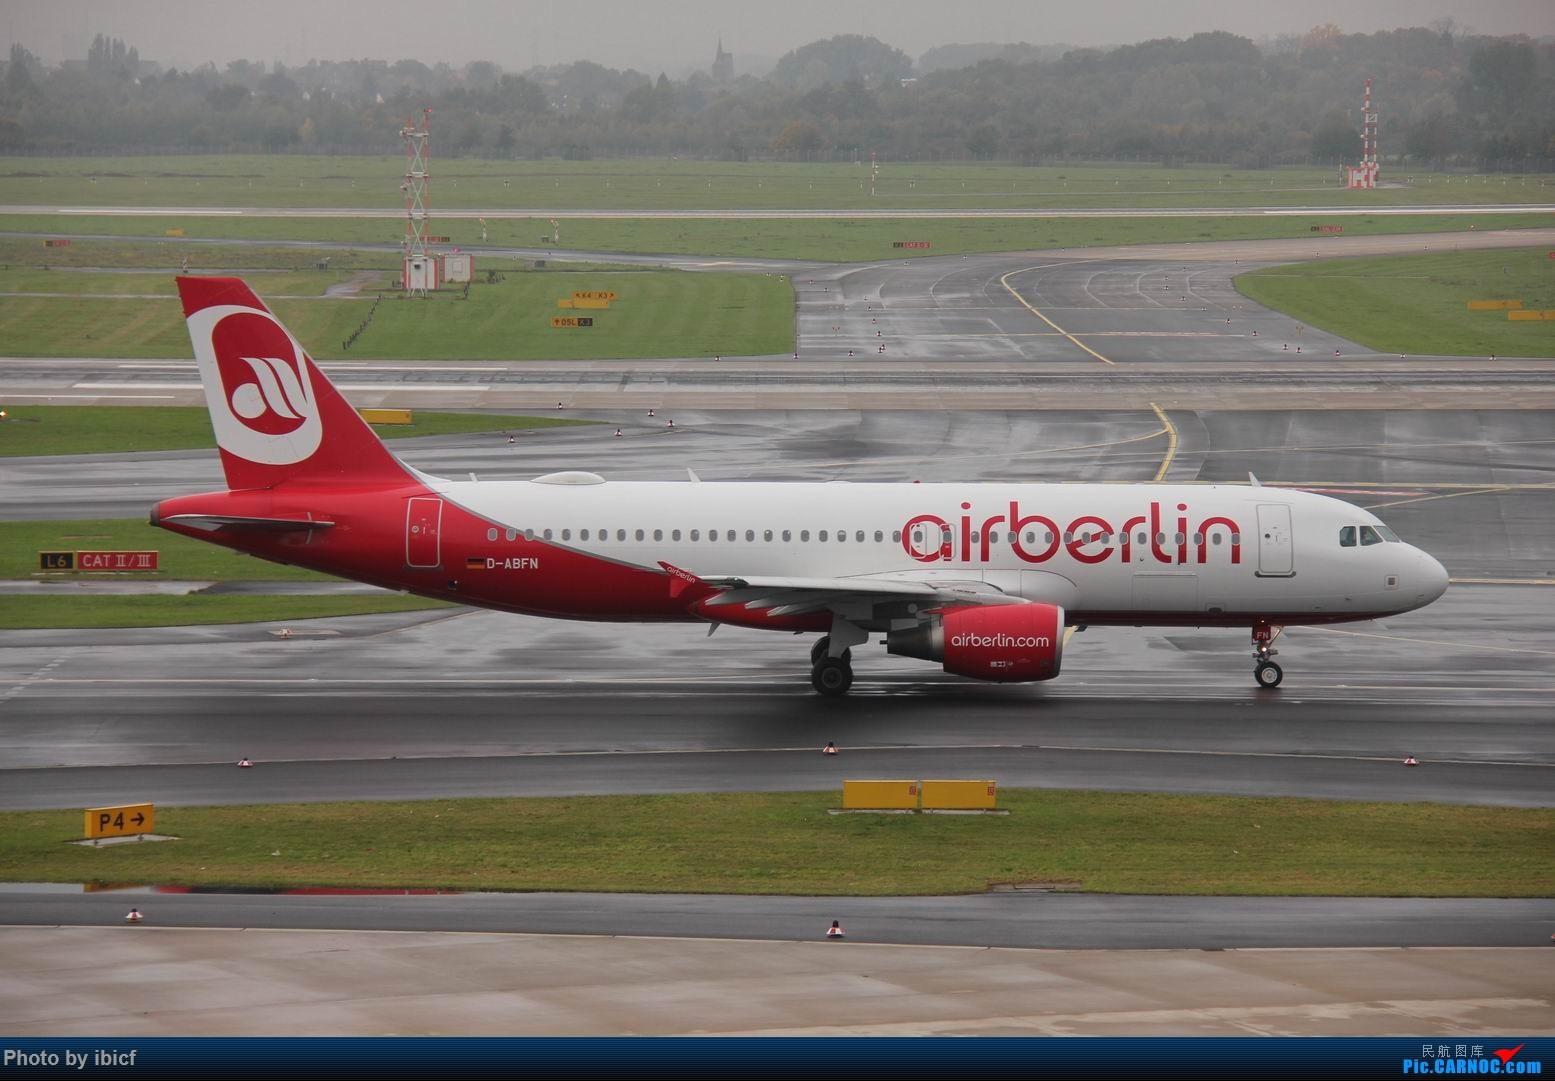 Re:[原创]国庆杜塞拍机 AIRBUS A320-200 D-ABFN DUS